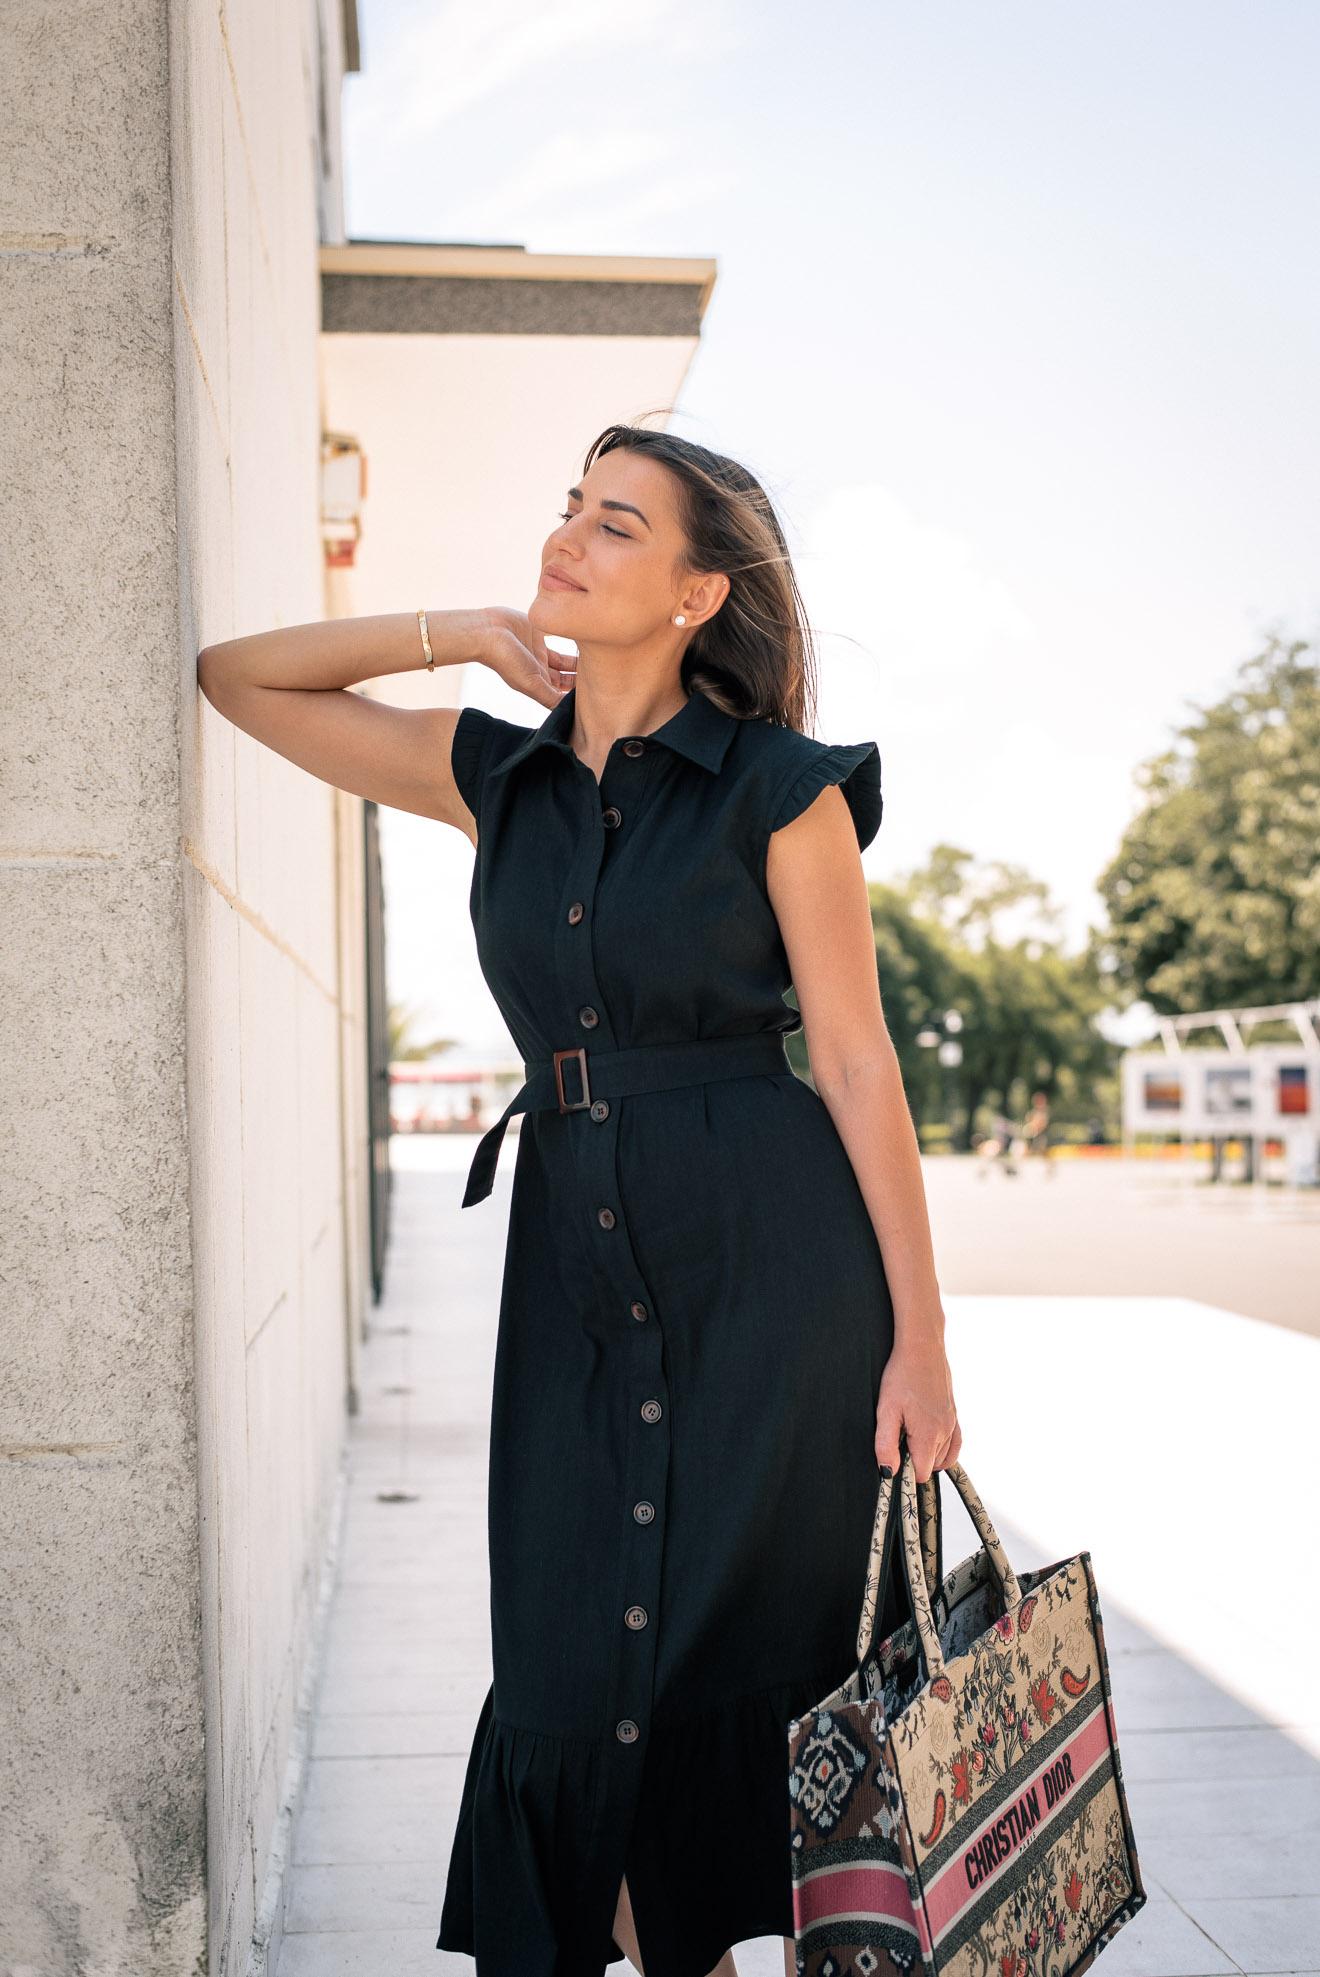 Black Savanna dress for hot summer